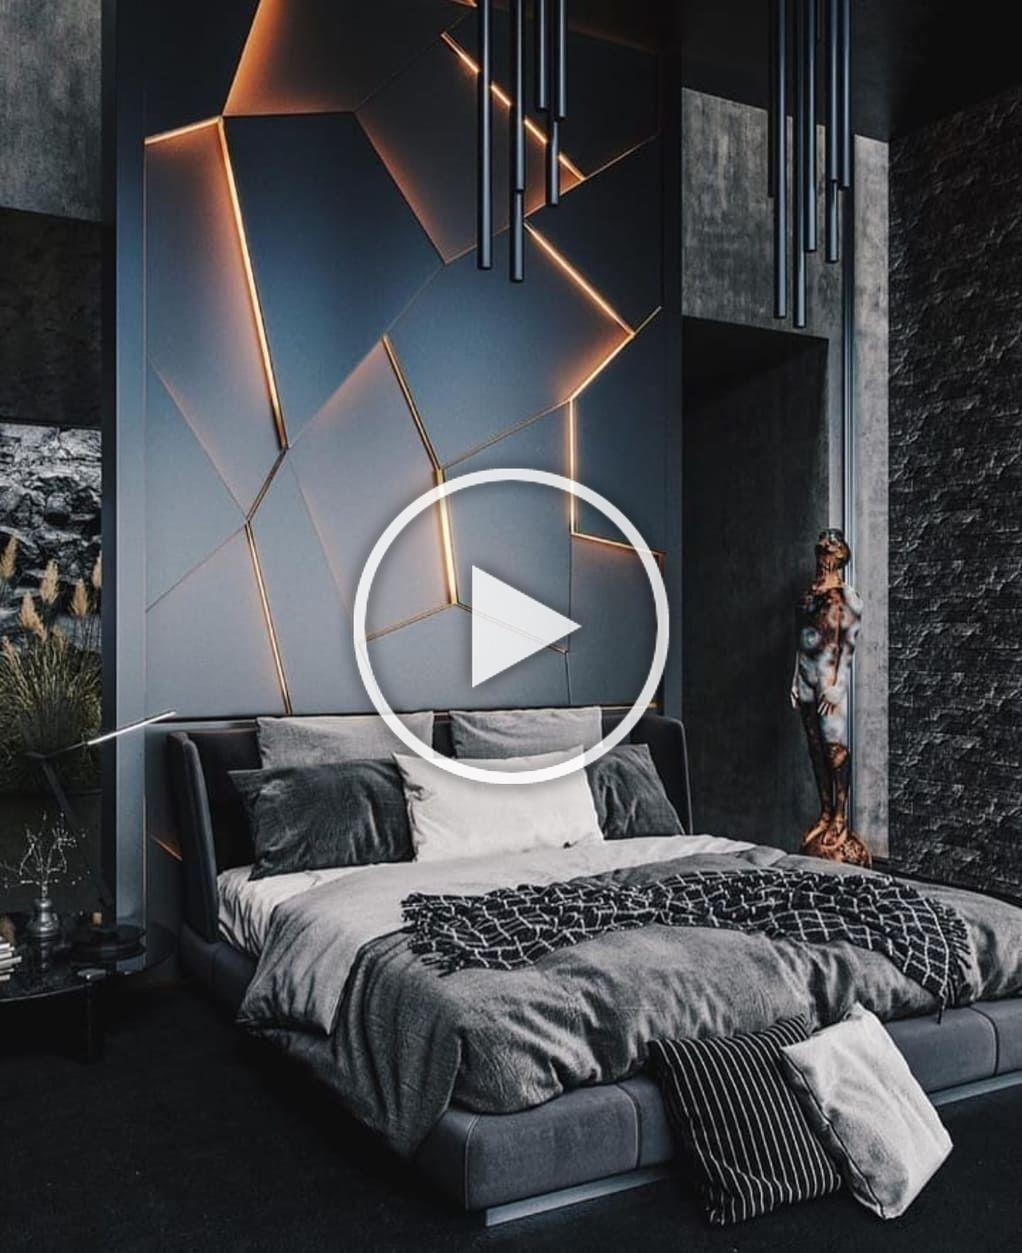 Minimal Interior Design Inspiration 182 Ultralinx Bedroom Design Styles Modern Bedroom Modern Bedroom Design